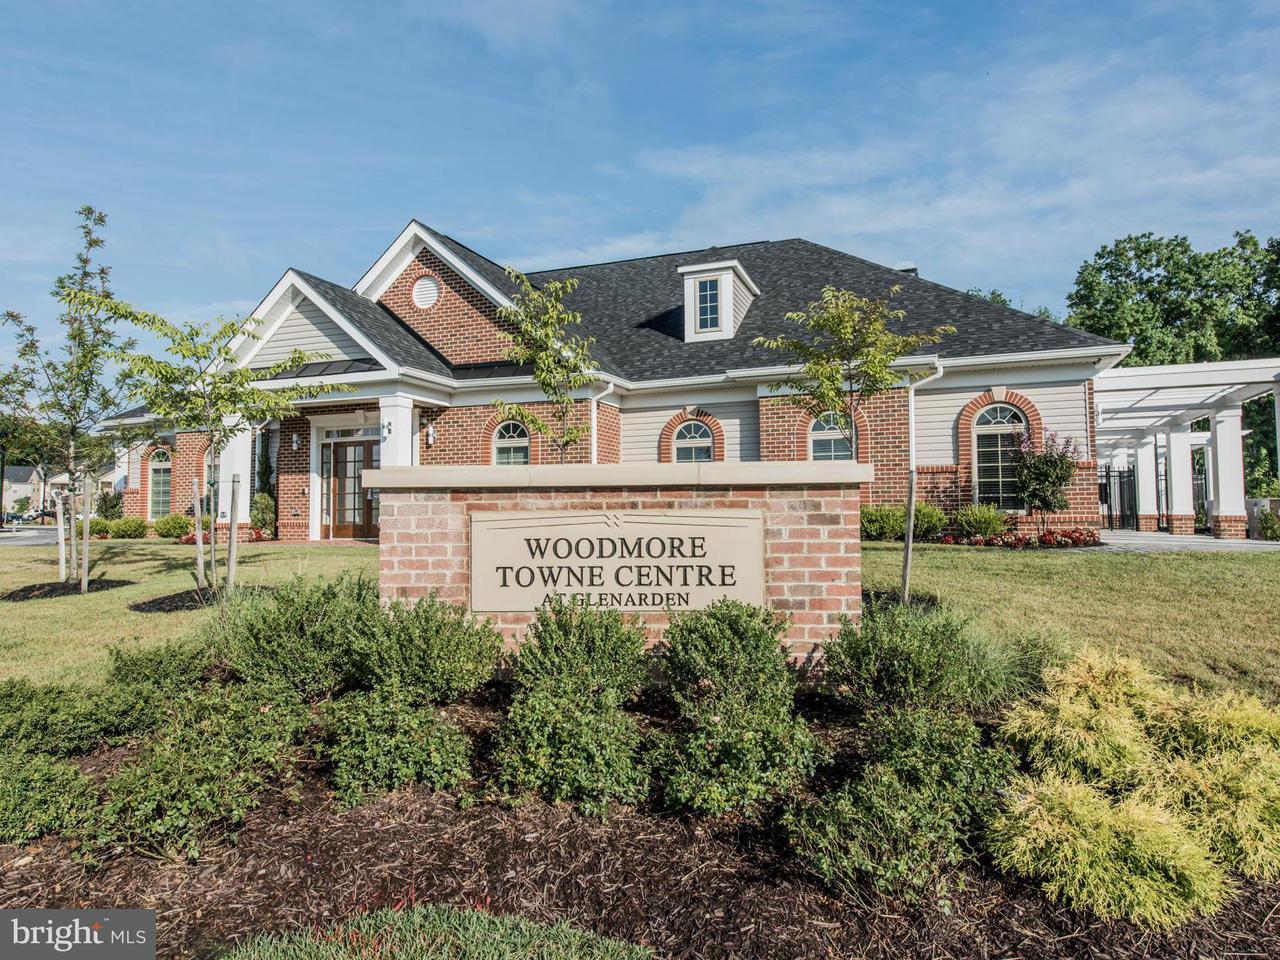 Single Family Home for Sale at 2400 ST. NICHOLAS WAY 2400 ST. NICHOLAS WAY Glenarden, Maryland 20706 United States